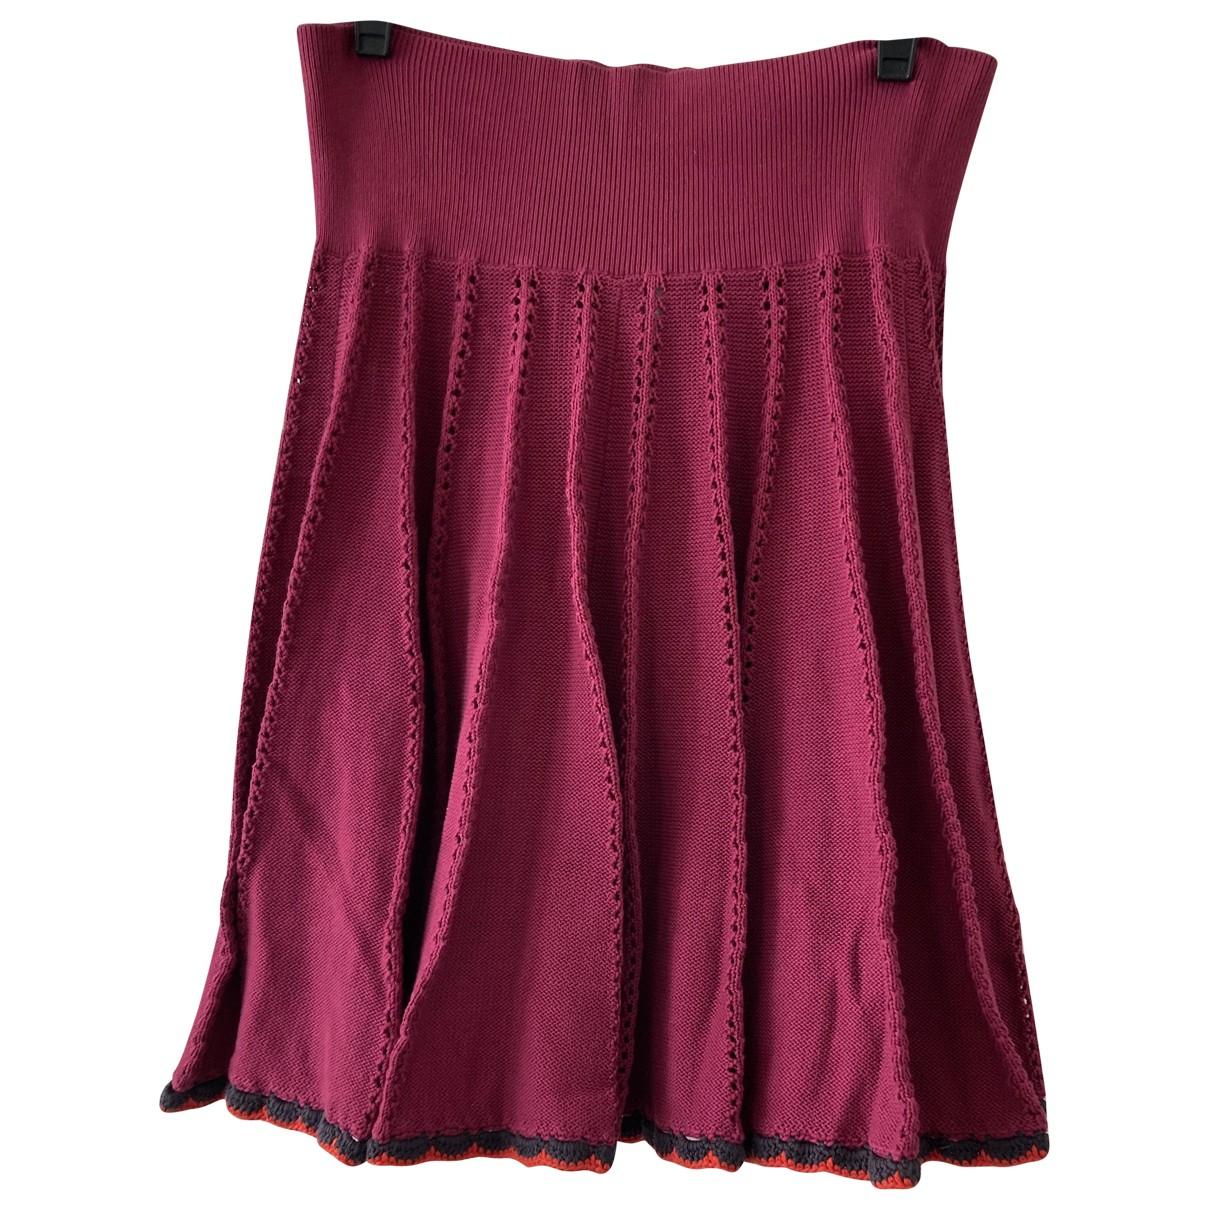 Sonia By Sonia Rykiel - Jupe   pour femme en coton - rose